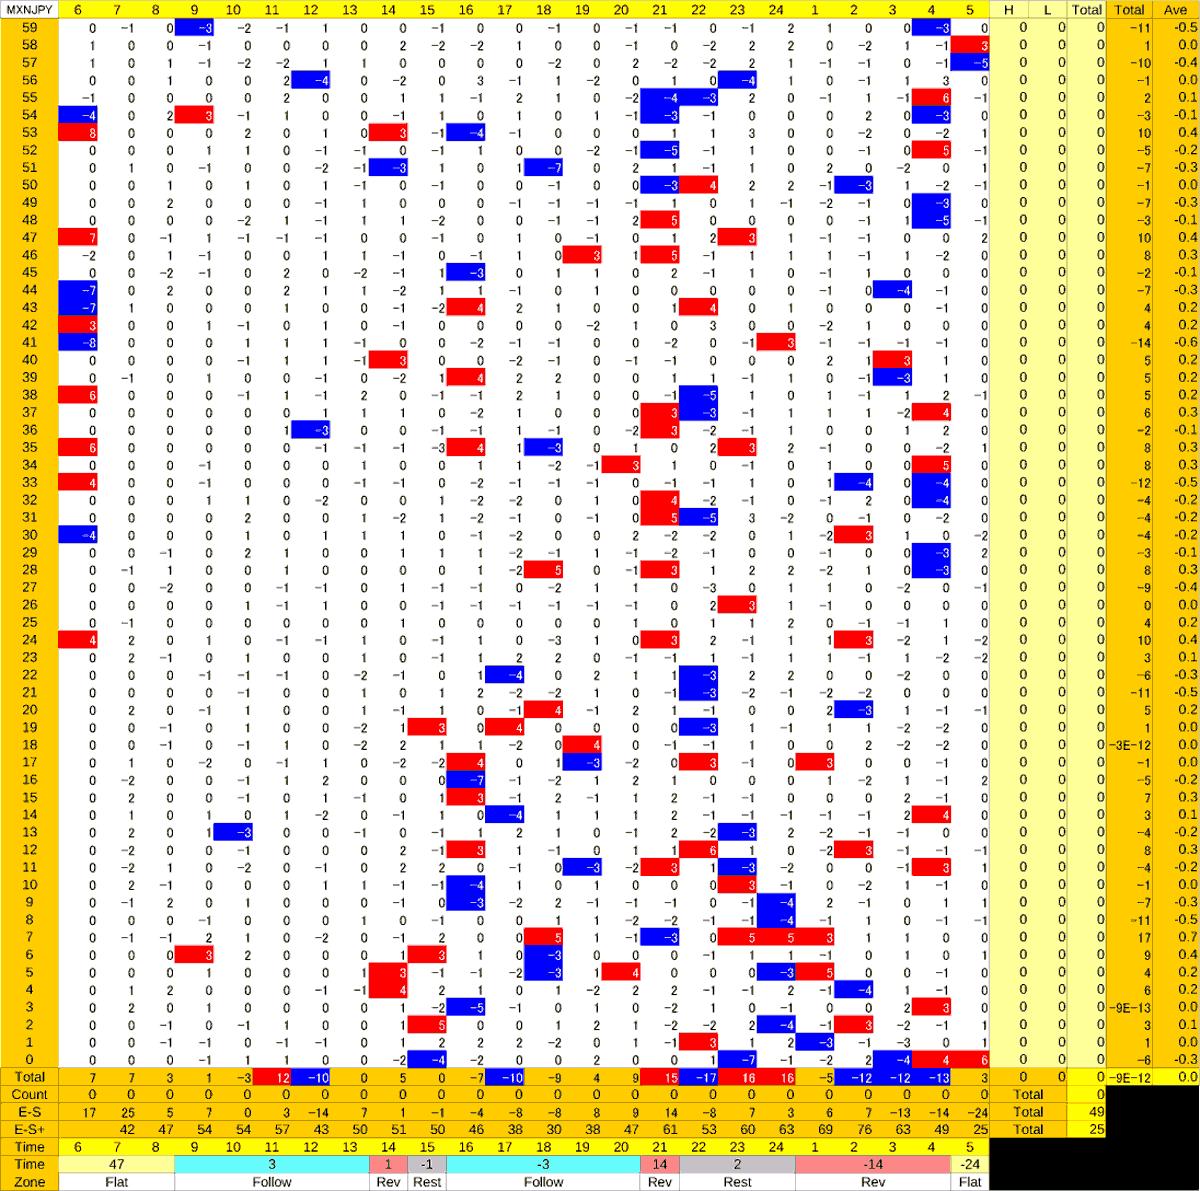 20200528_HS(3)MXNJPY